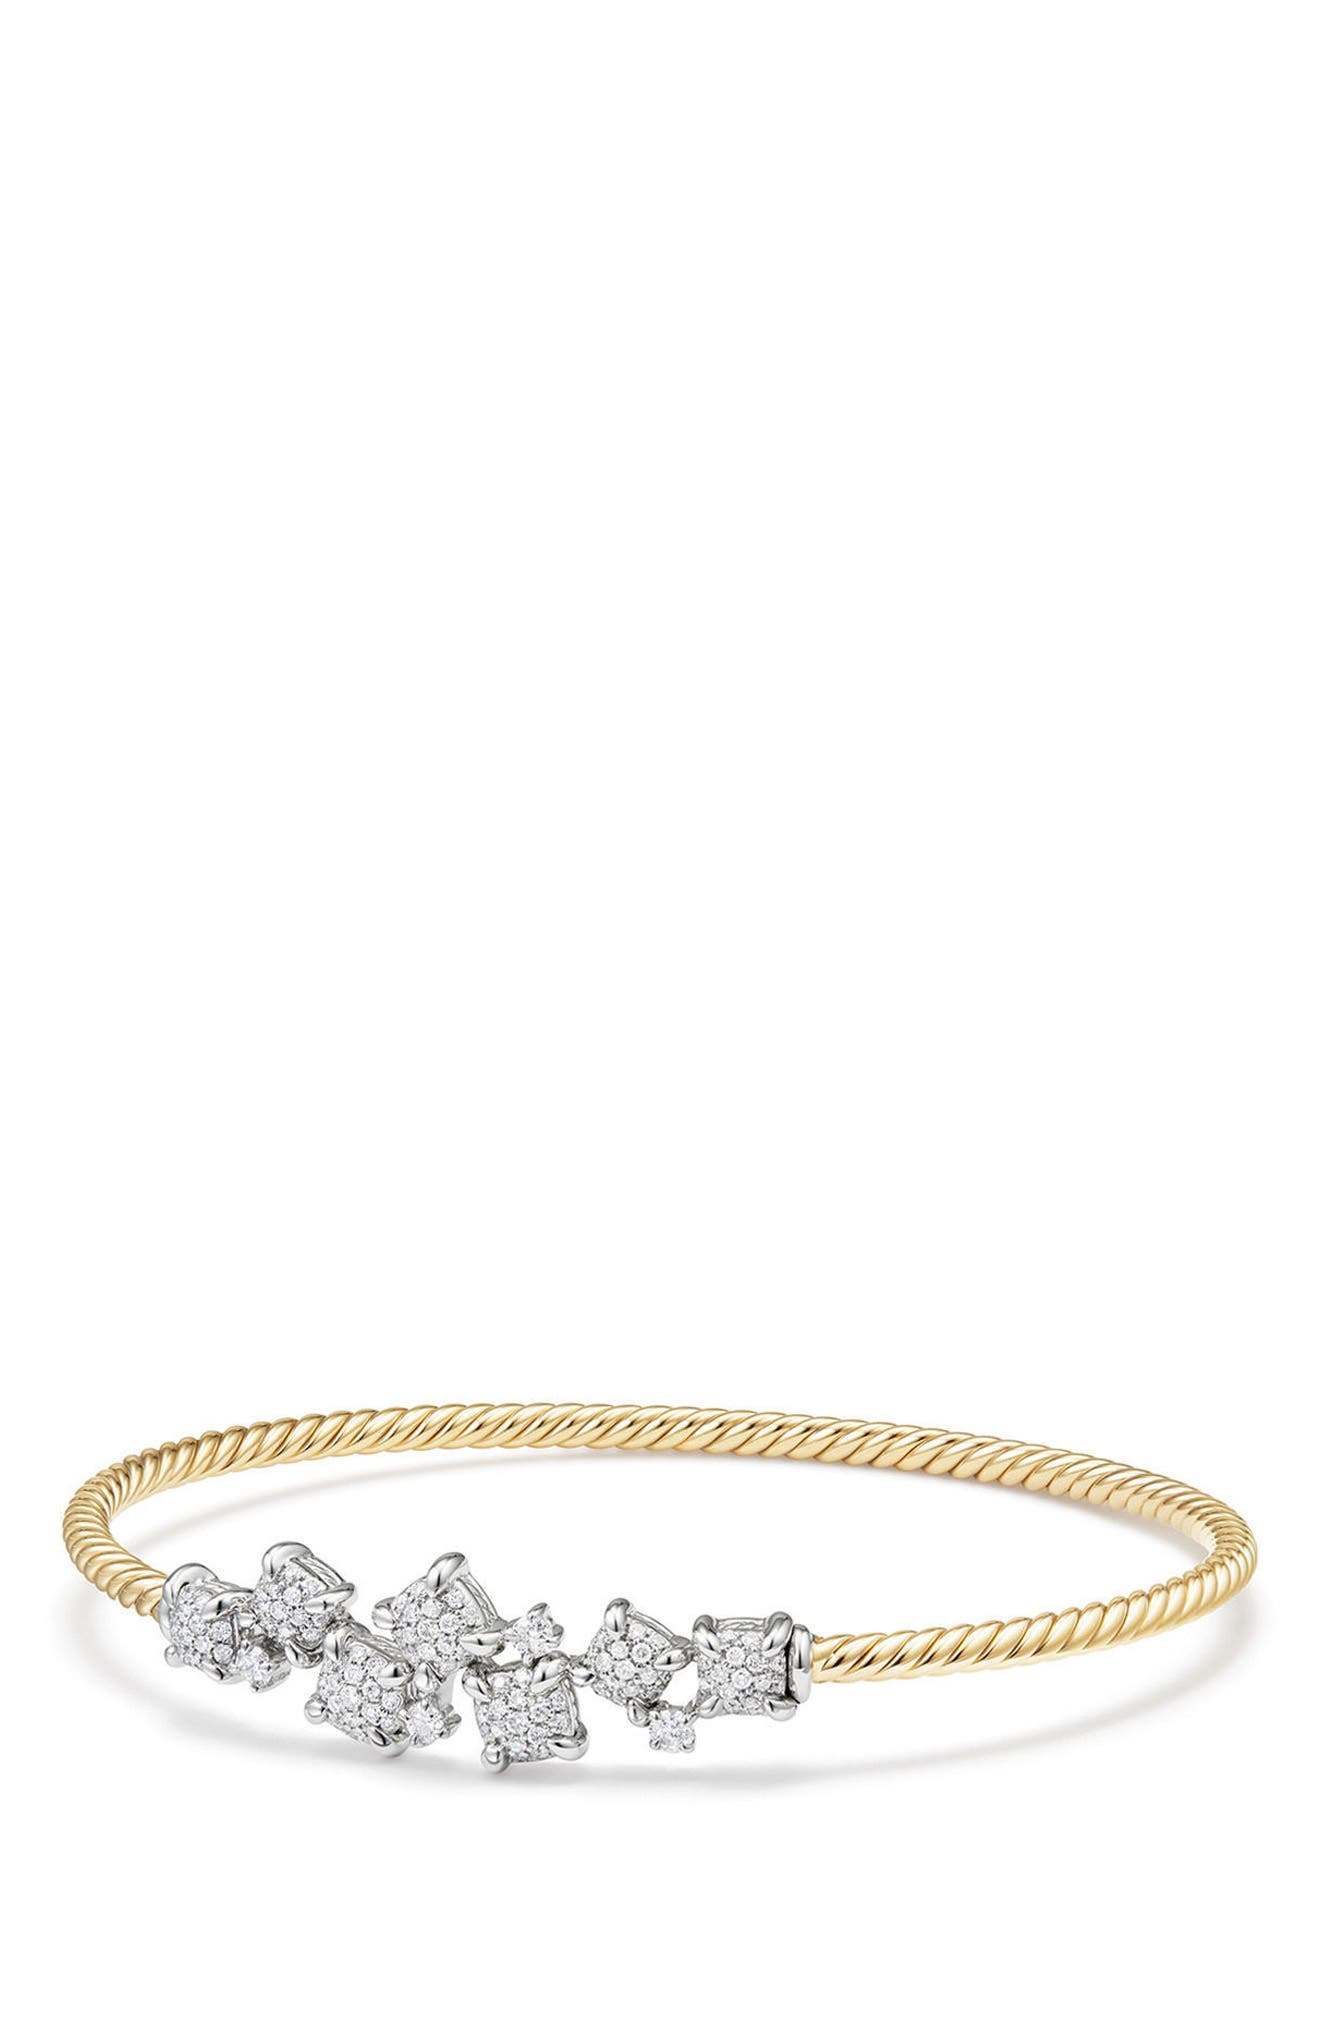 Alternate Image 1 Selected - David Yurman Precious Châtelaine Bracelet with Diamonds in 18K Gold